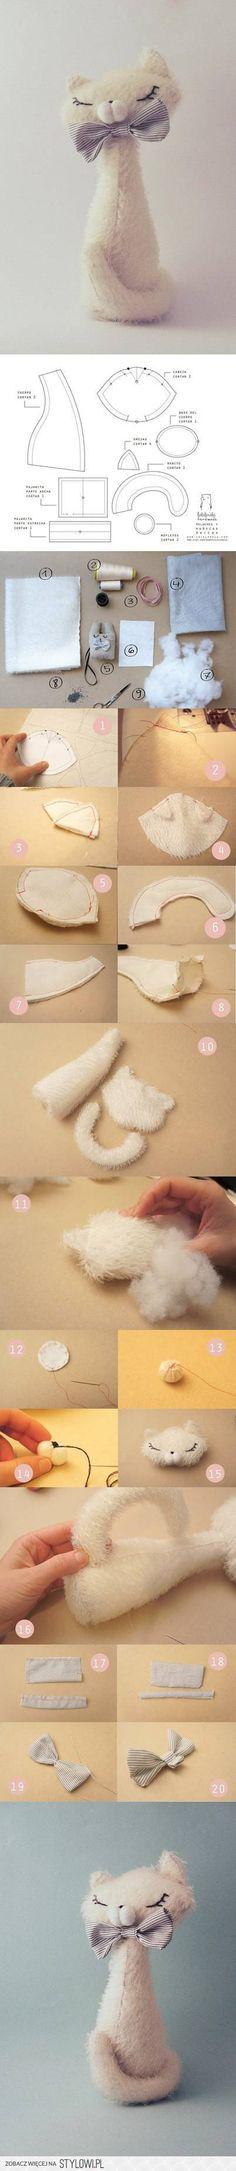 DIY Elegant Cat DIY Projects | UsefulDIY.com na Stylowi.pl